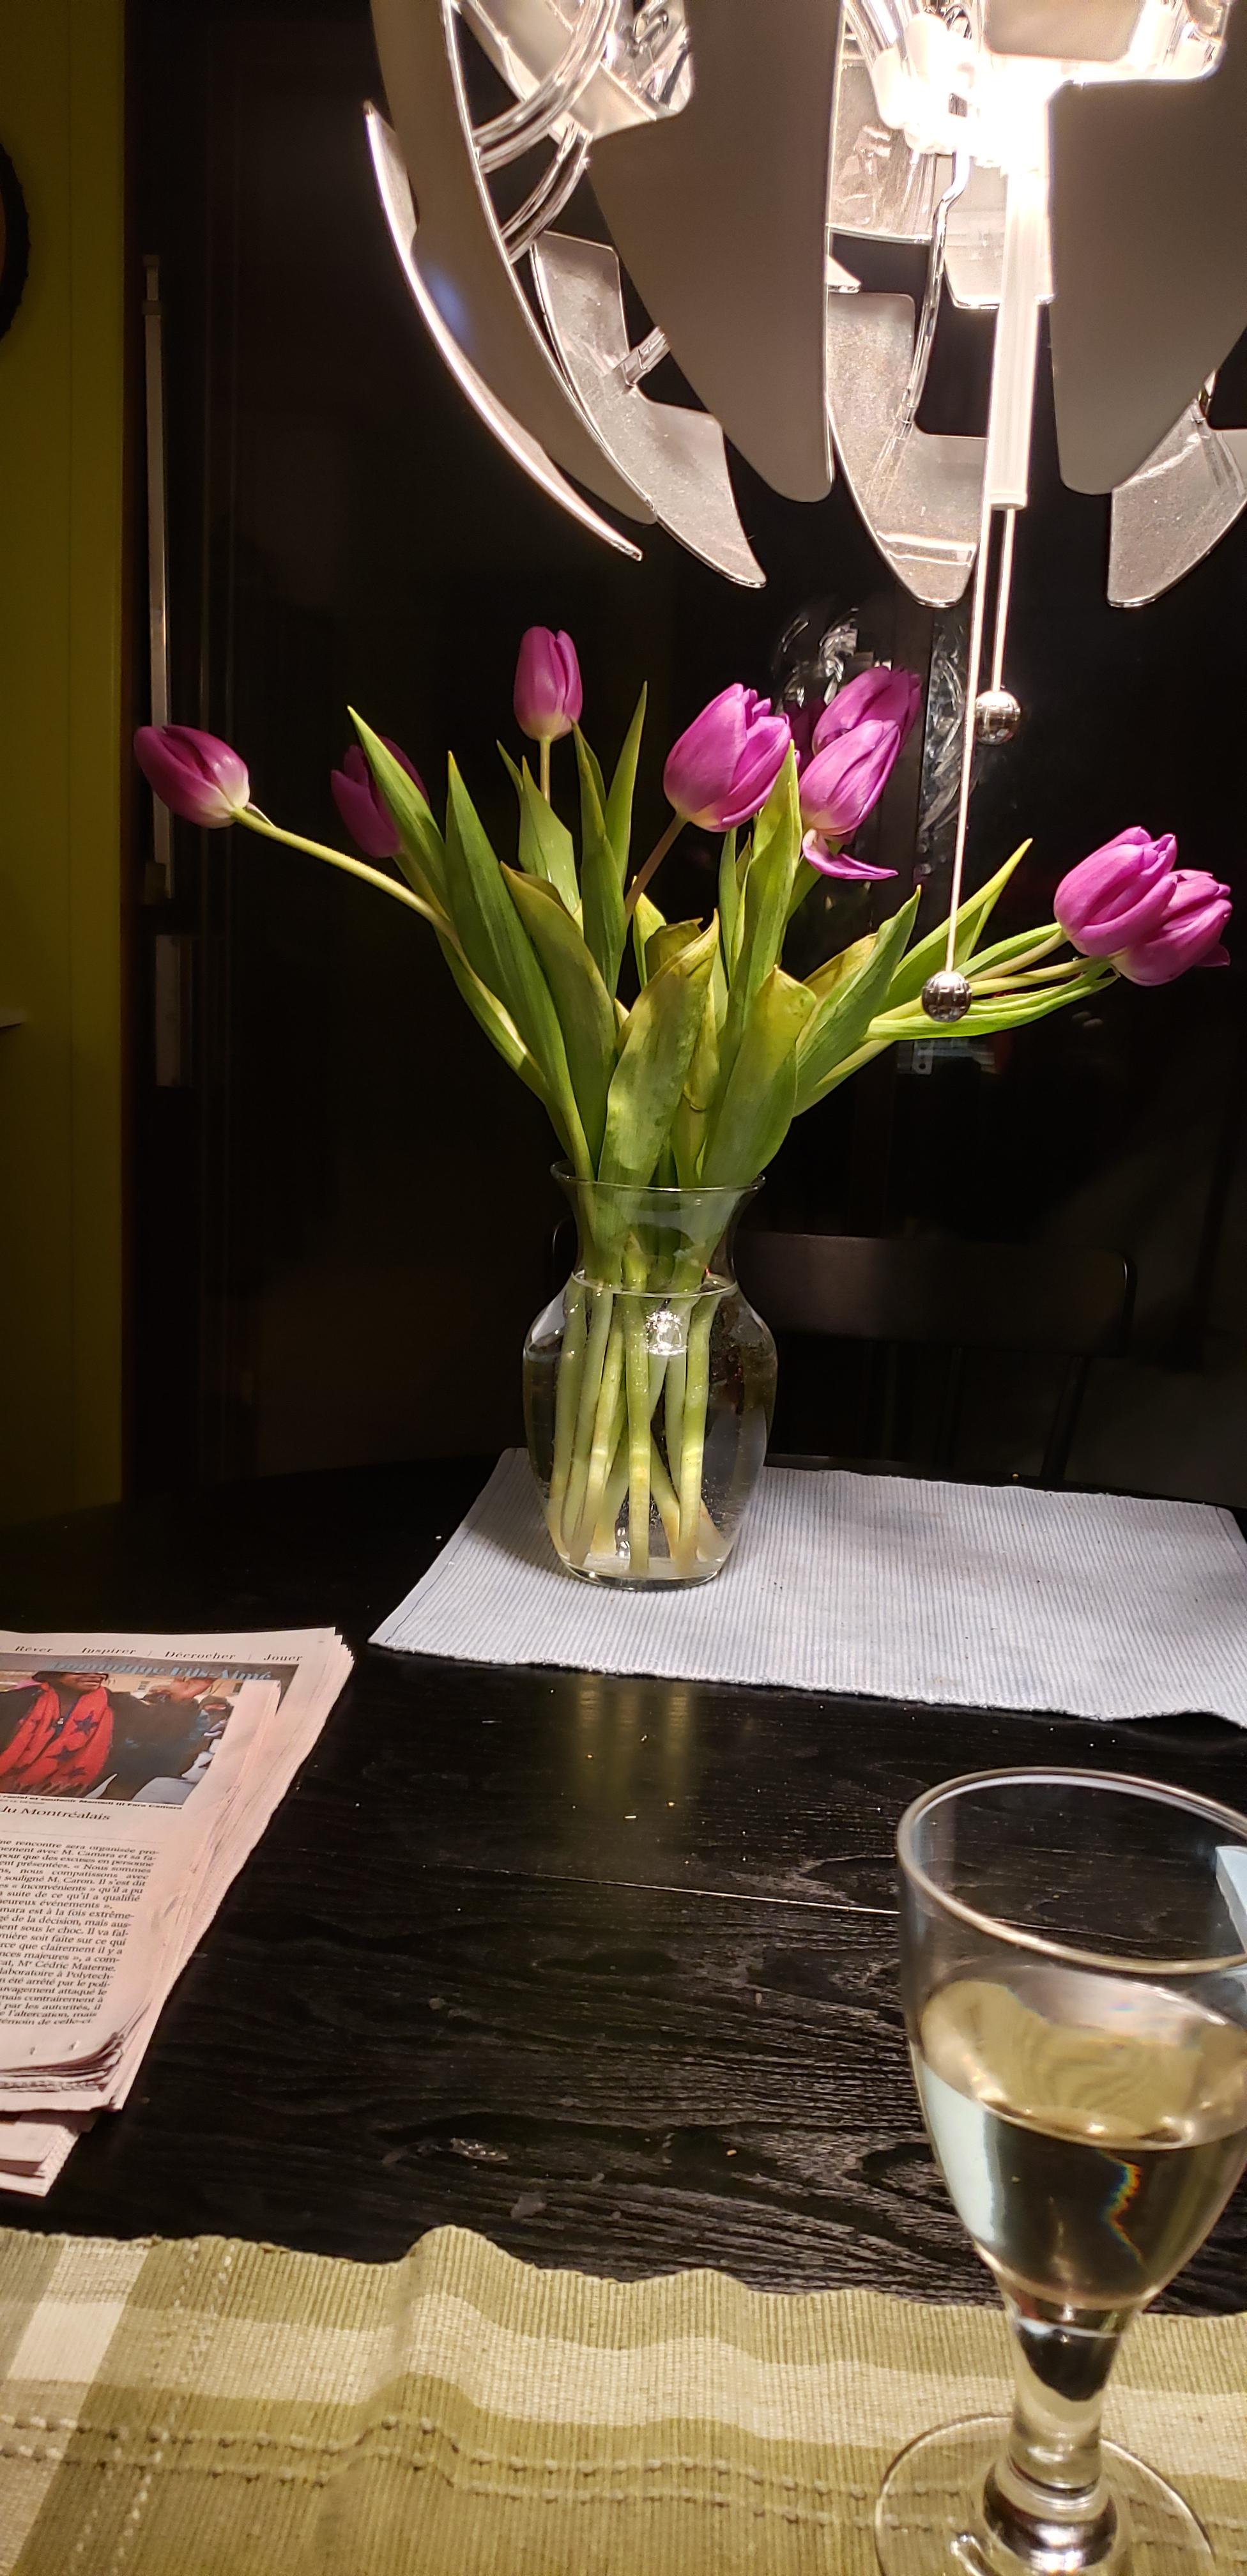 Tulipes de février